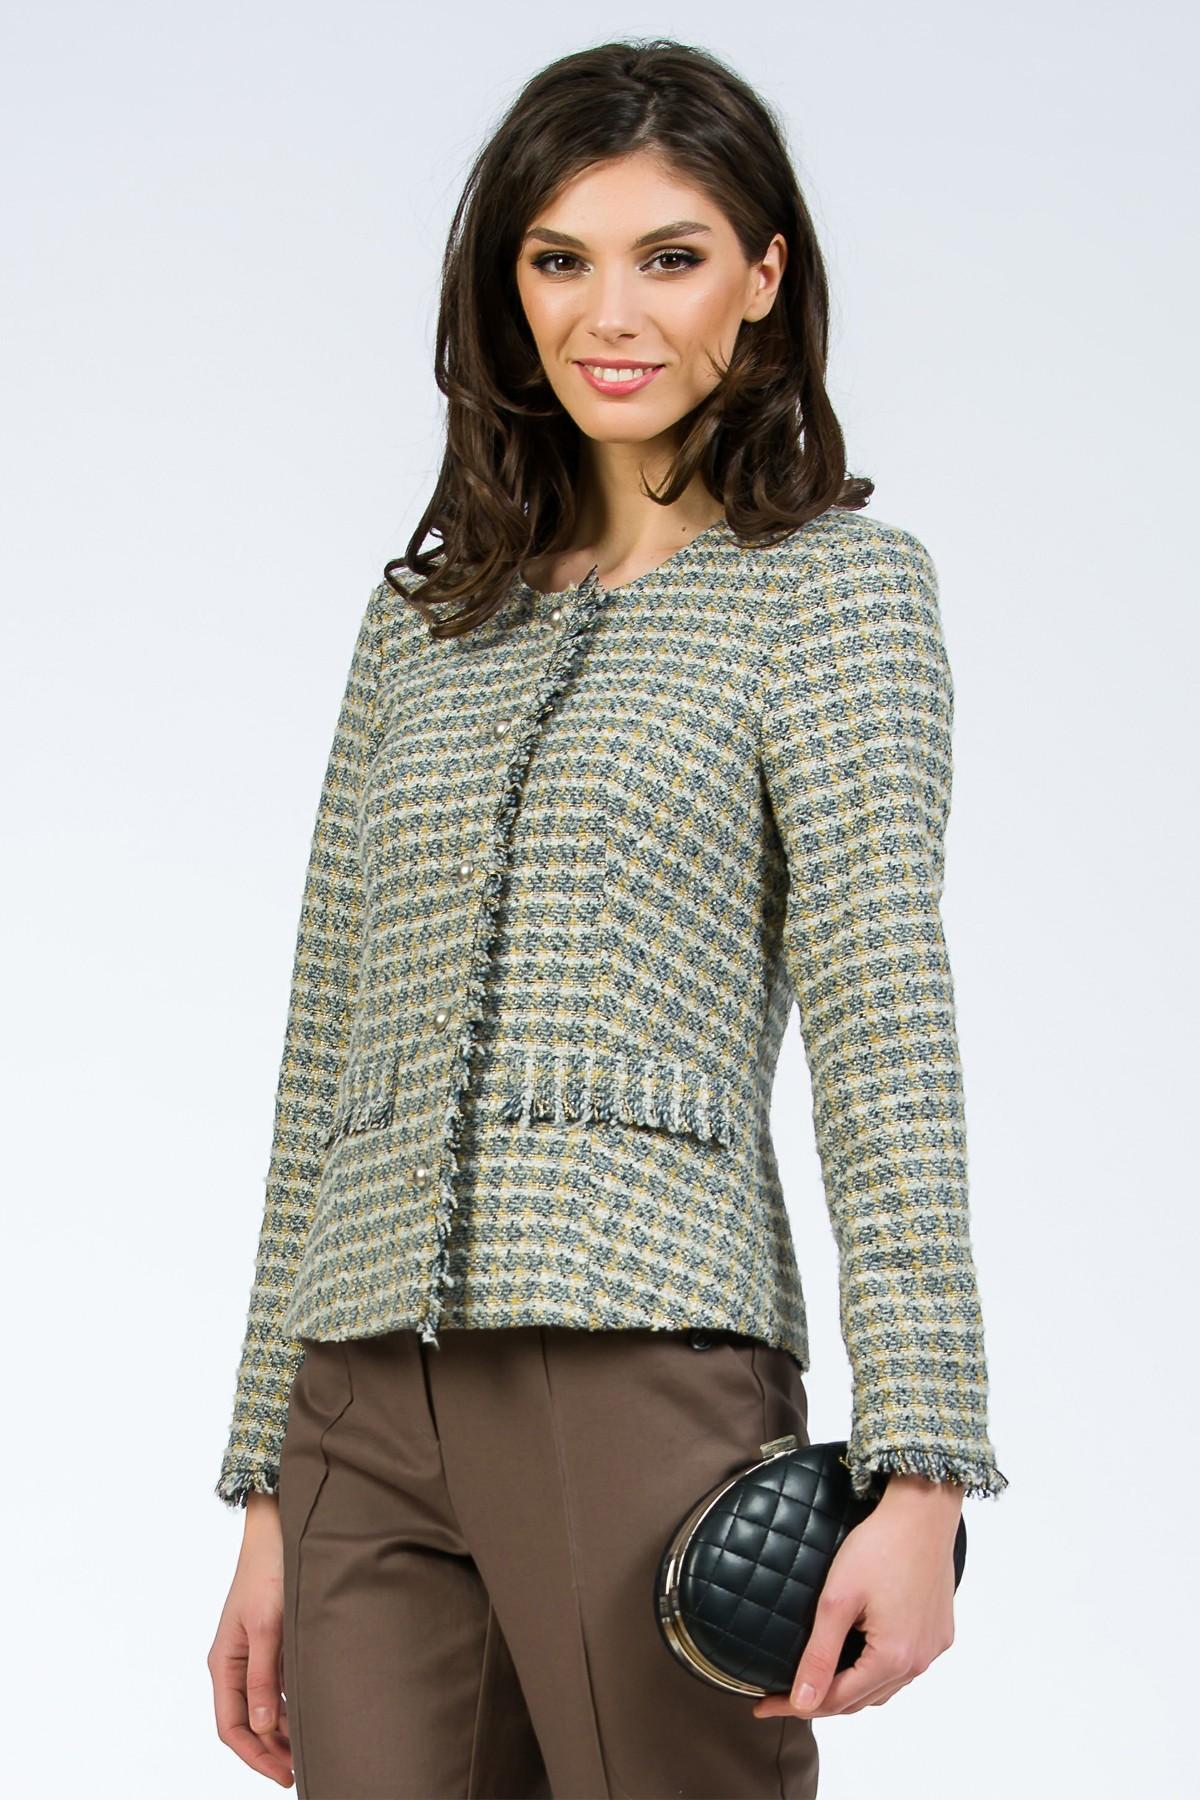 chanel-like-jacket